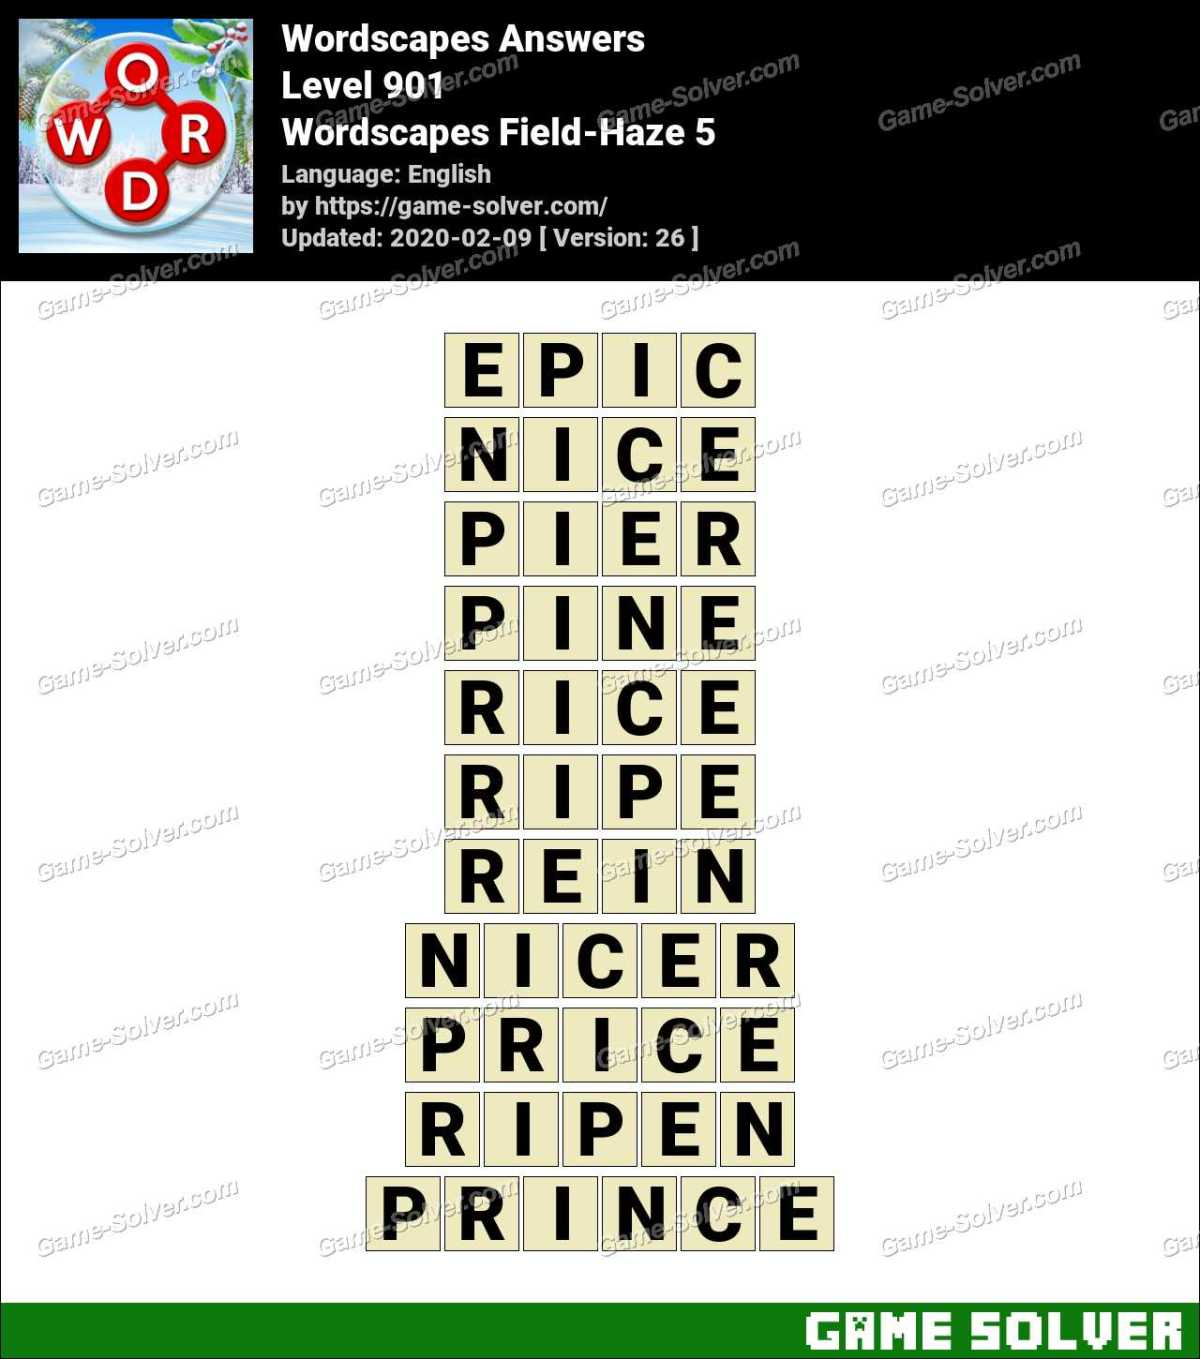 Wordscapes Field-Haze 5 Answers